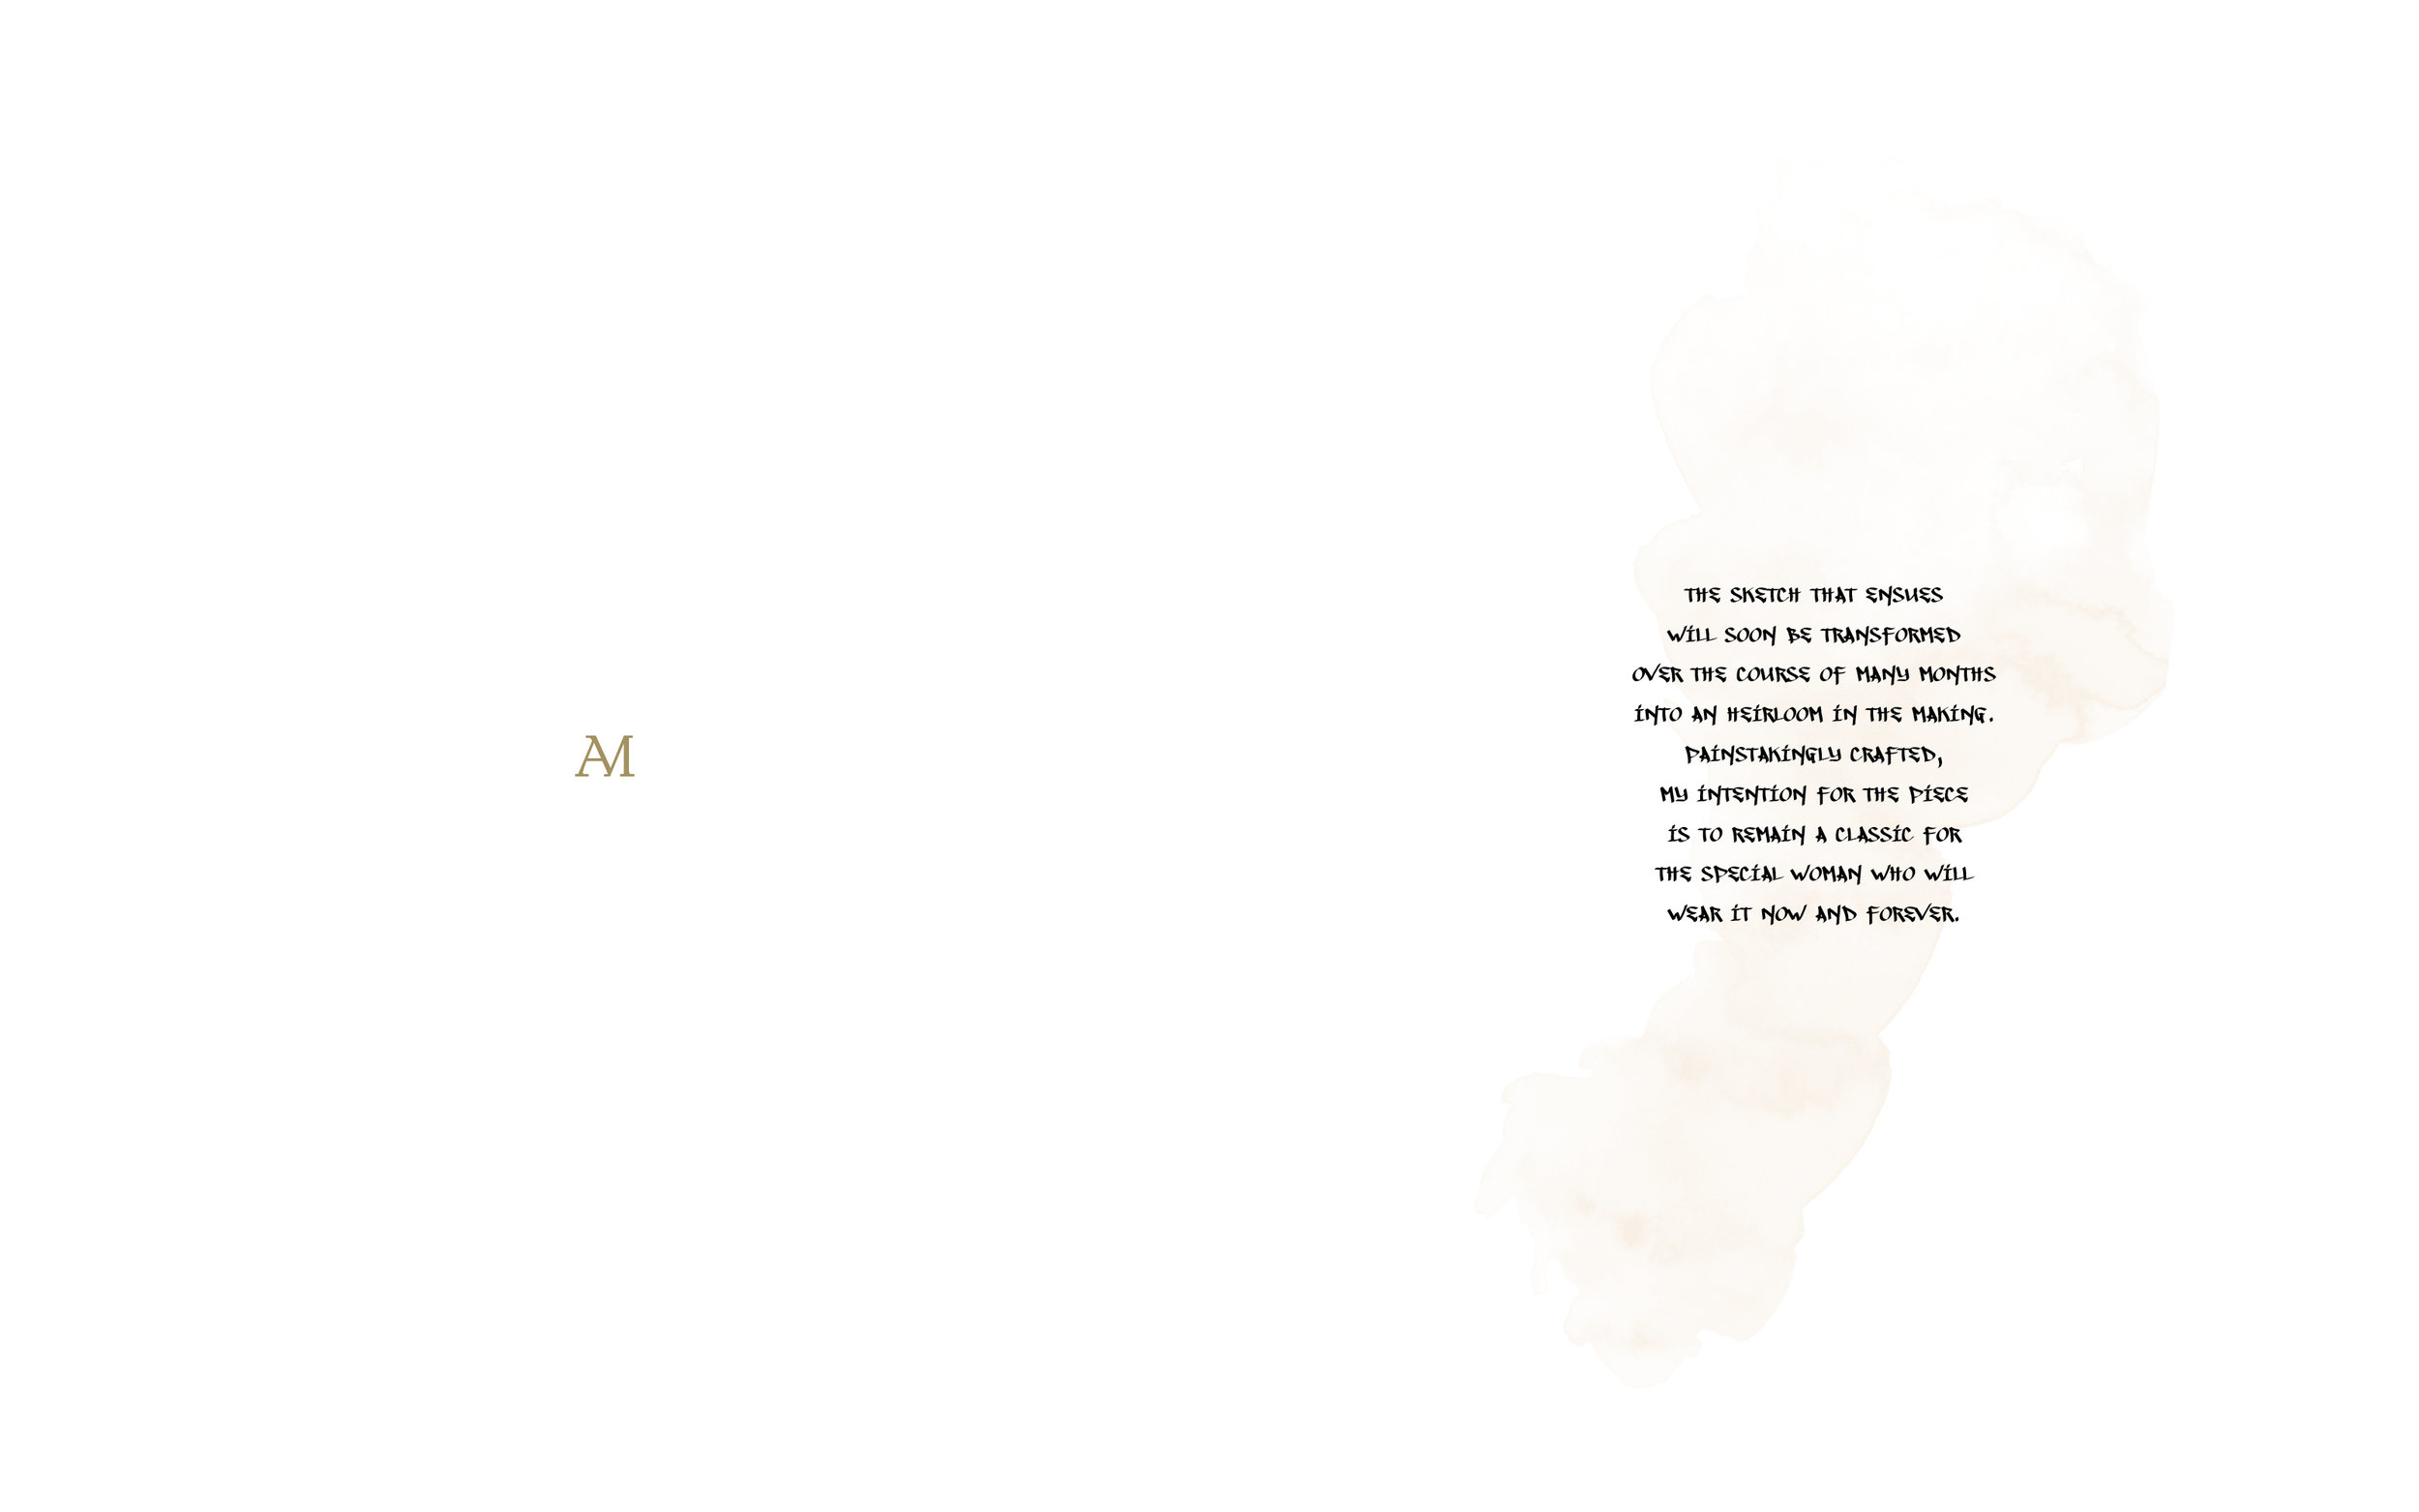 AM_COLLECTORS_GUIDE NO. 5 03.12.185.jpg